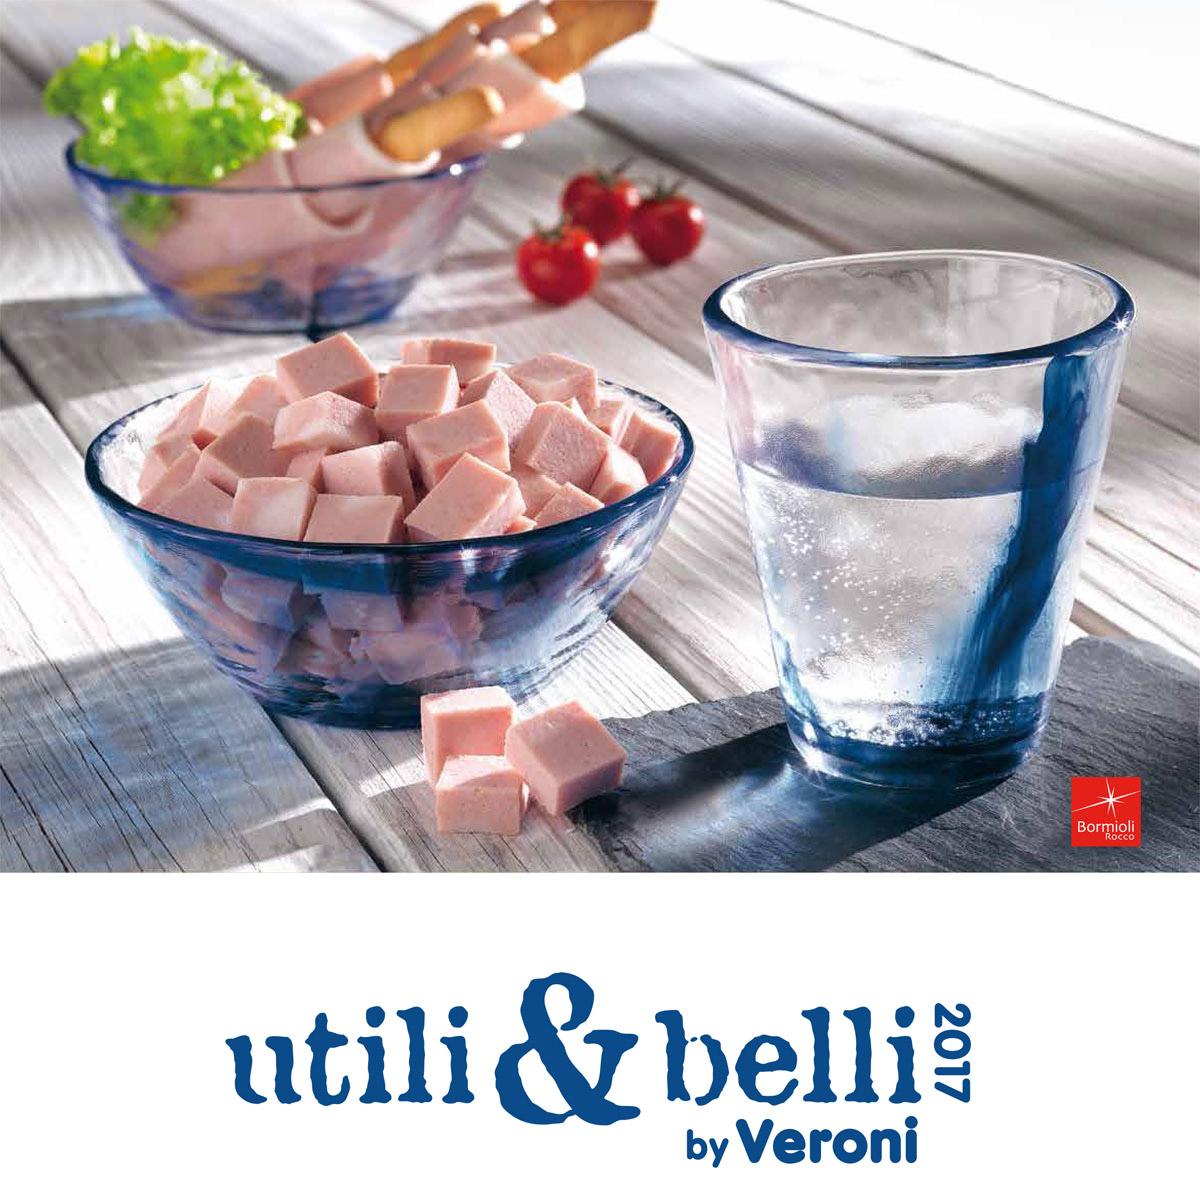 Utili&Belli_2017_locandina_1200x1200